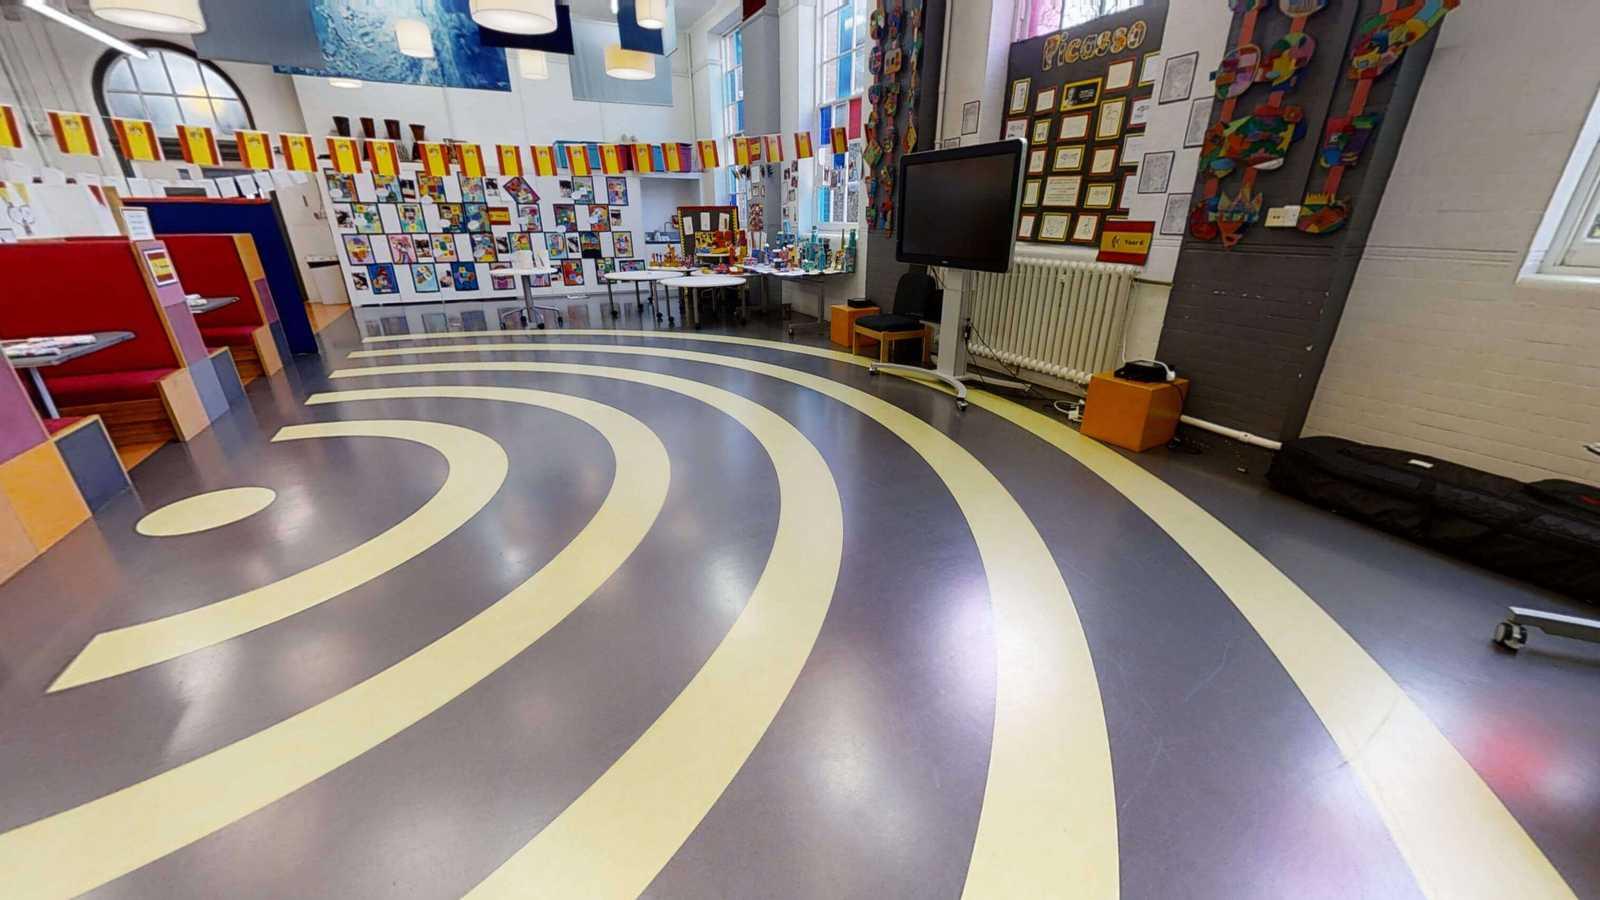 Spiral hall